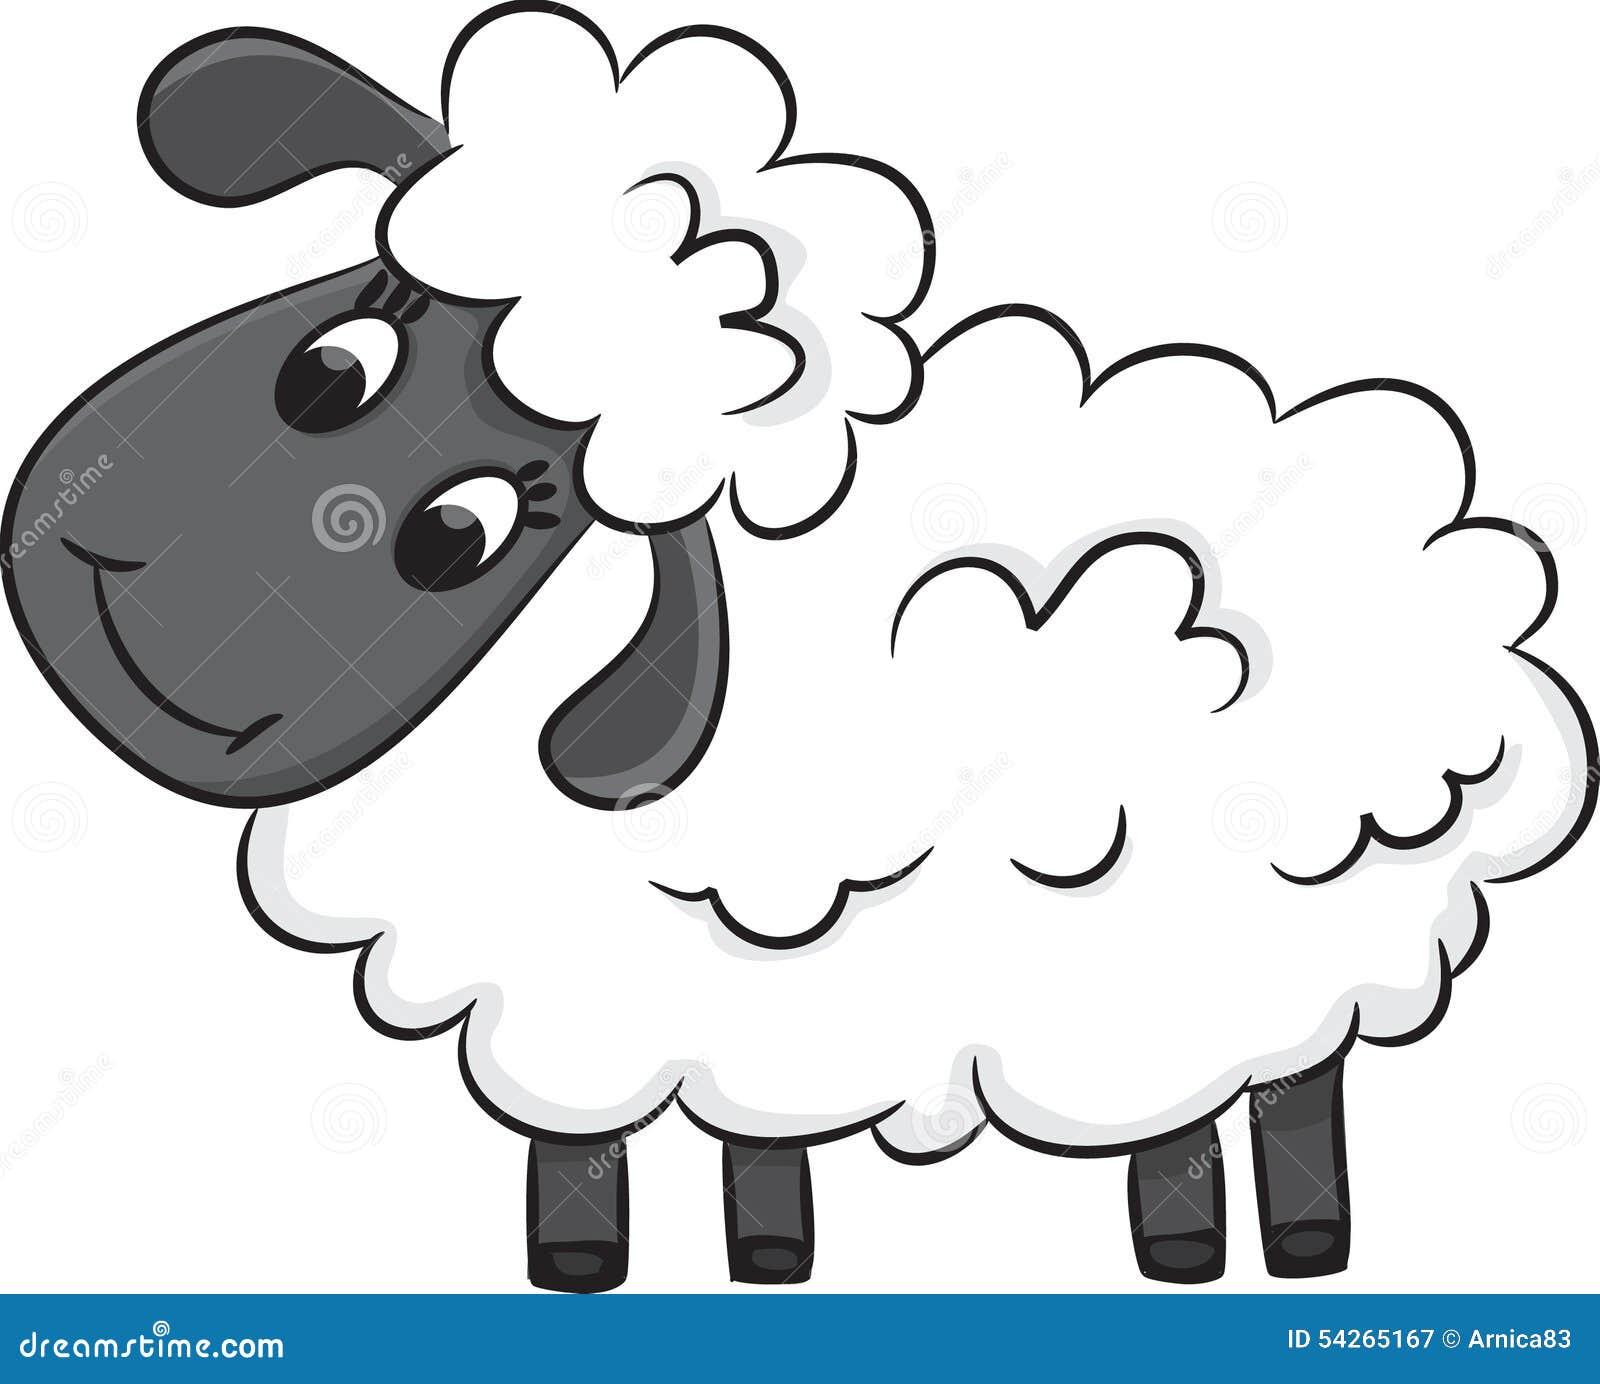 cartoon sheep stock vector image 54265167 Violin Silhouette Violin Bow Clip Art